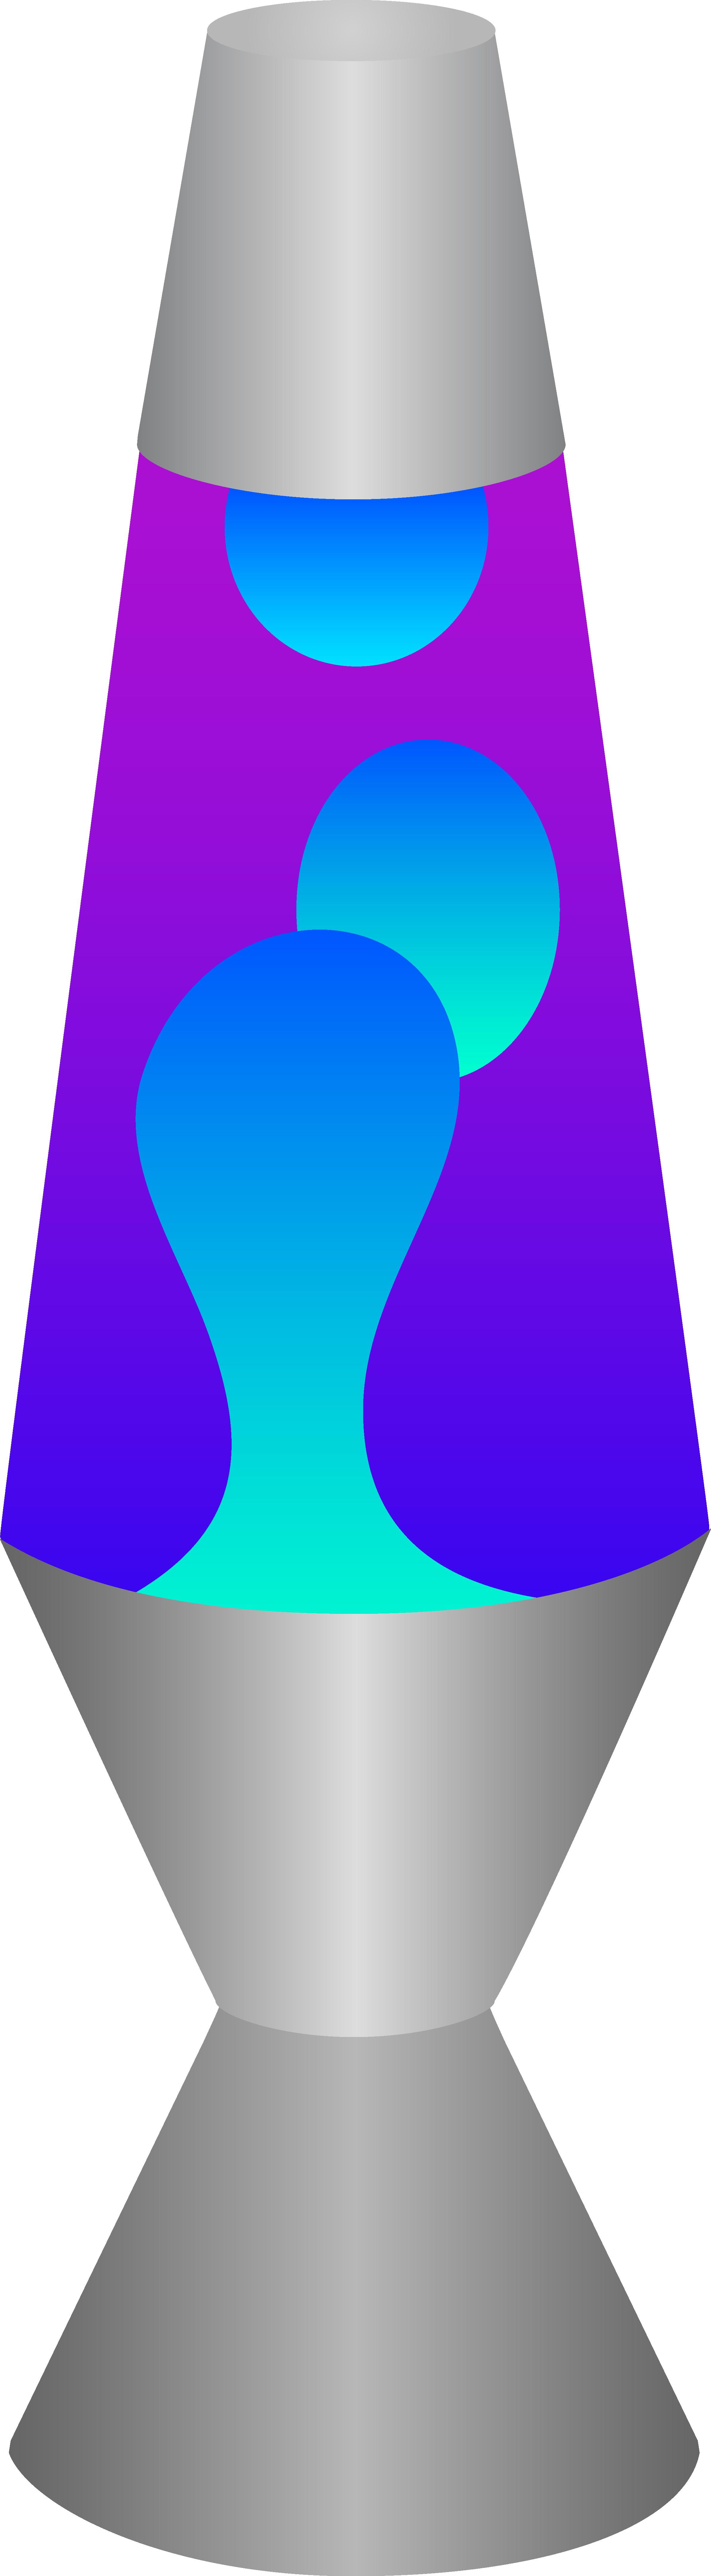 Liquid clipart #2, Download drawings